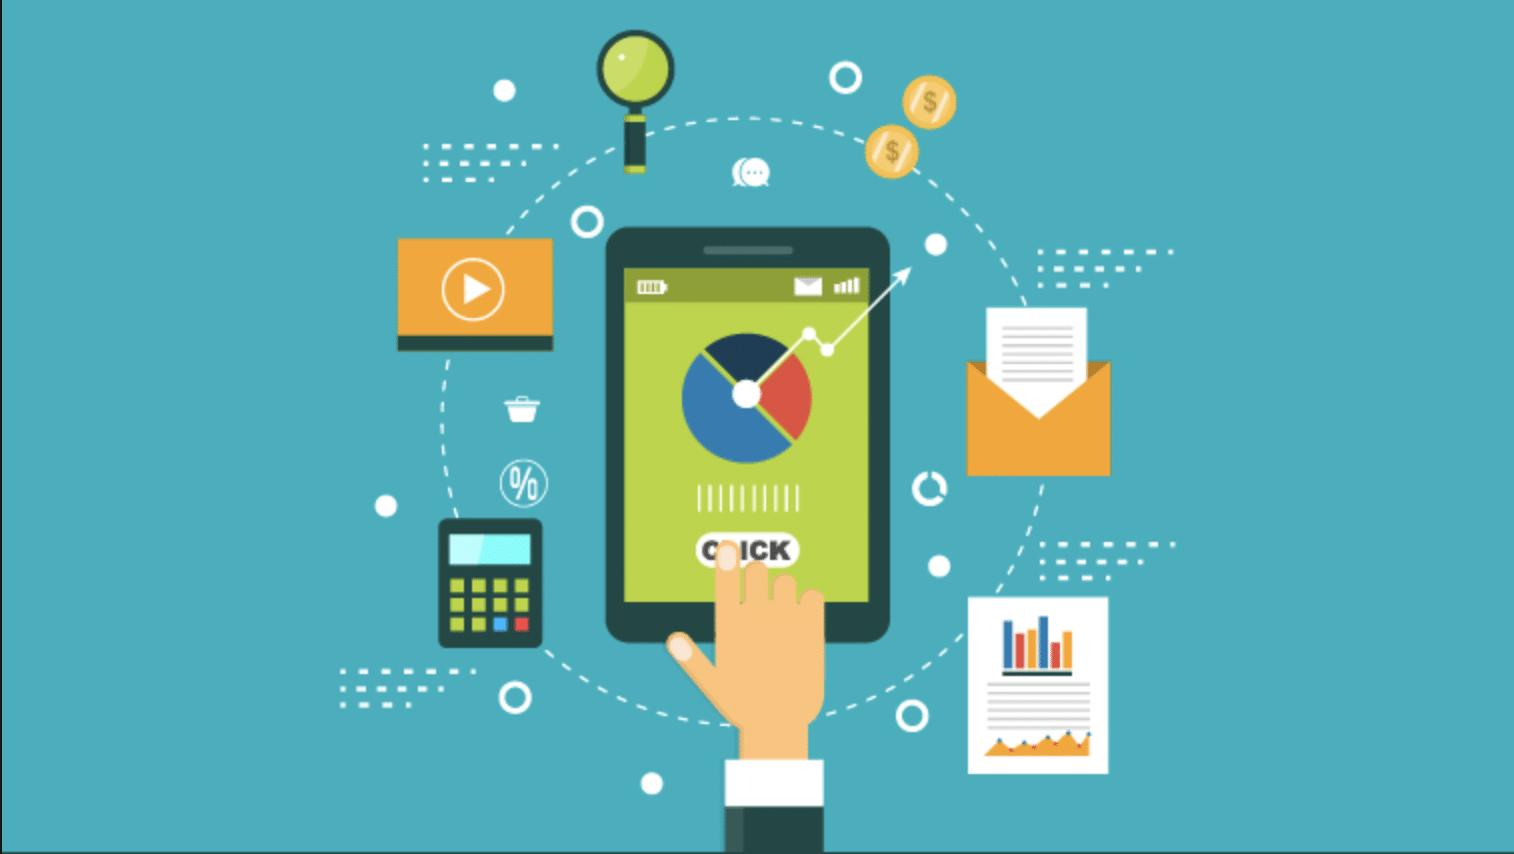 Optimize Your Click-through-Rates | seo agency, local seo service, local seo companies, white label seo, local seo expert